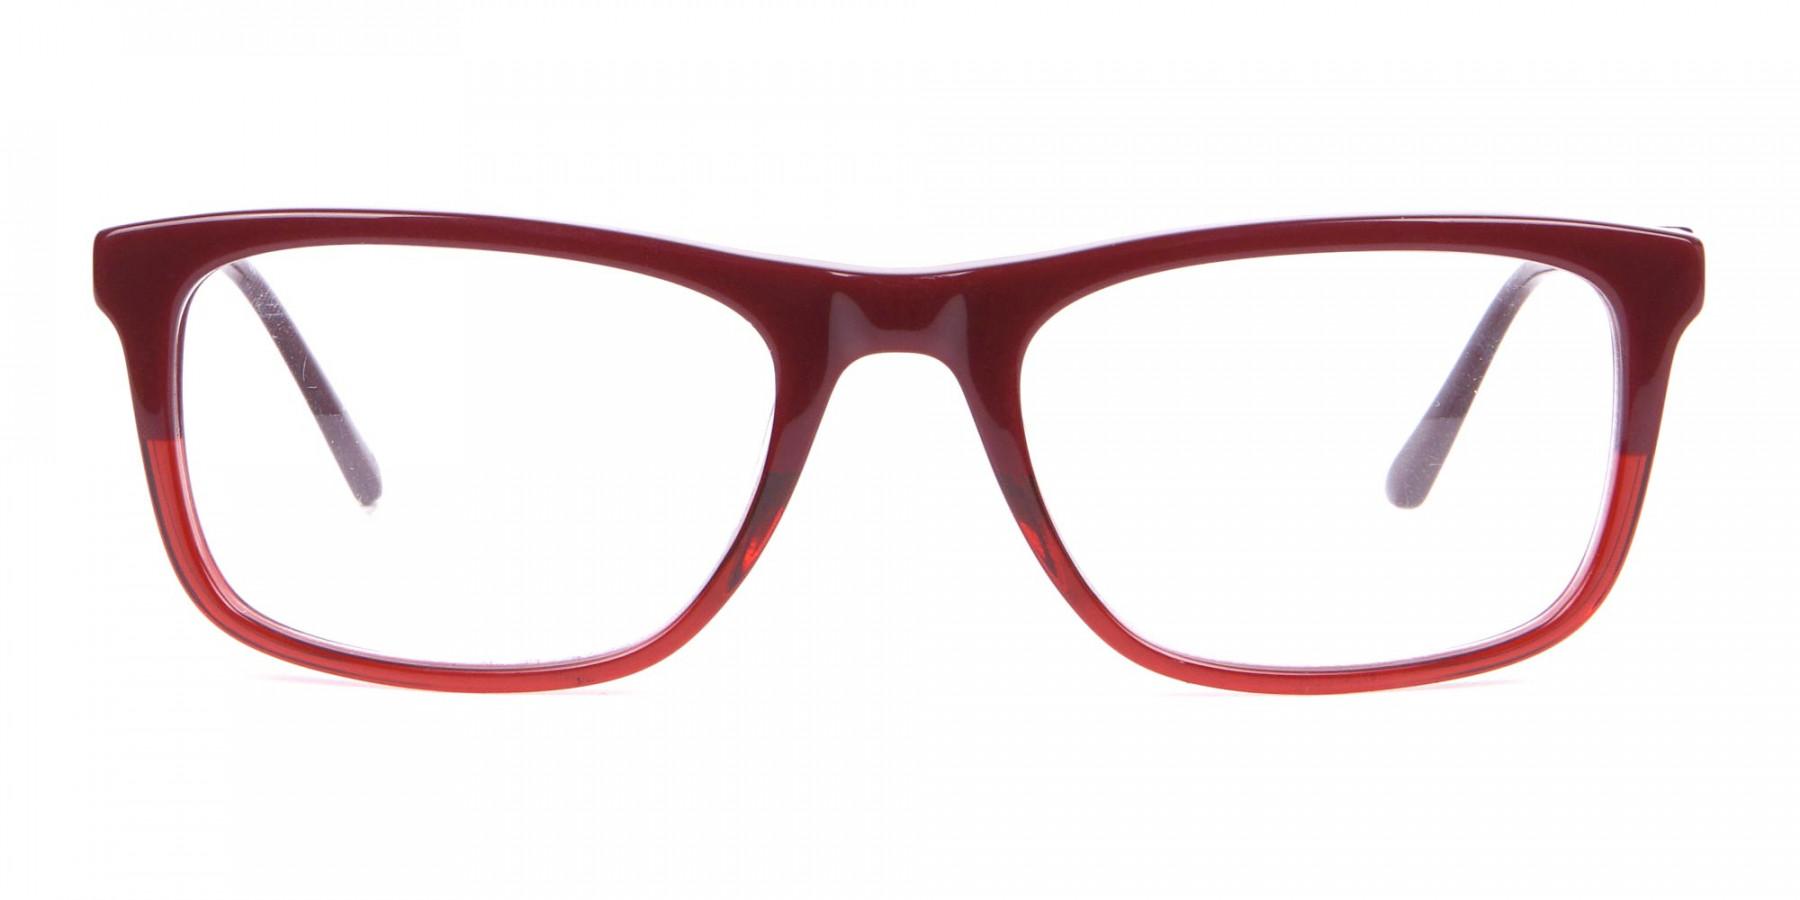 Calvin Klein CK19707 Two-Tone Rectangular Glasses Red-1